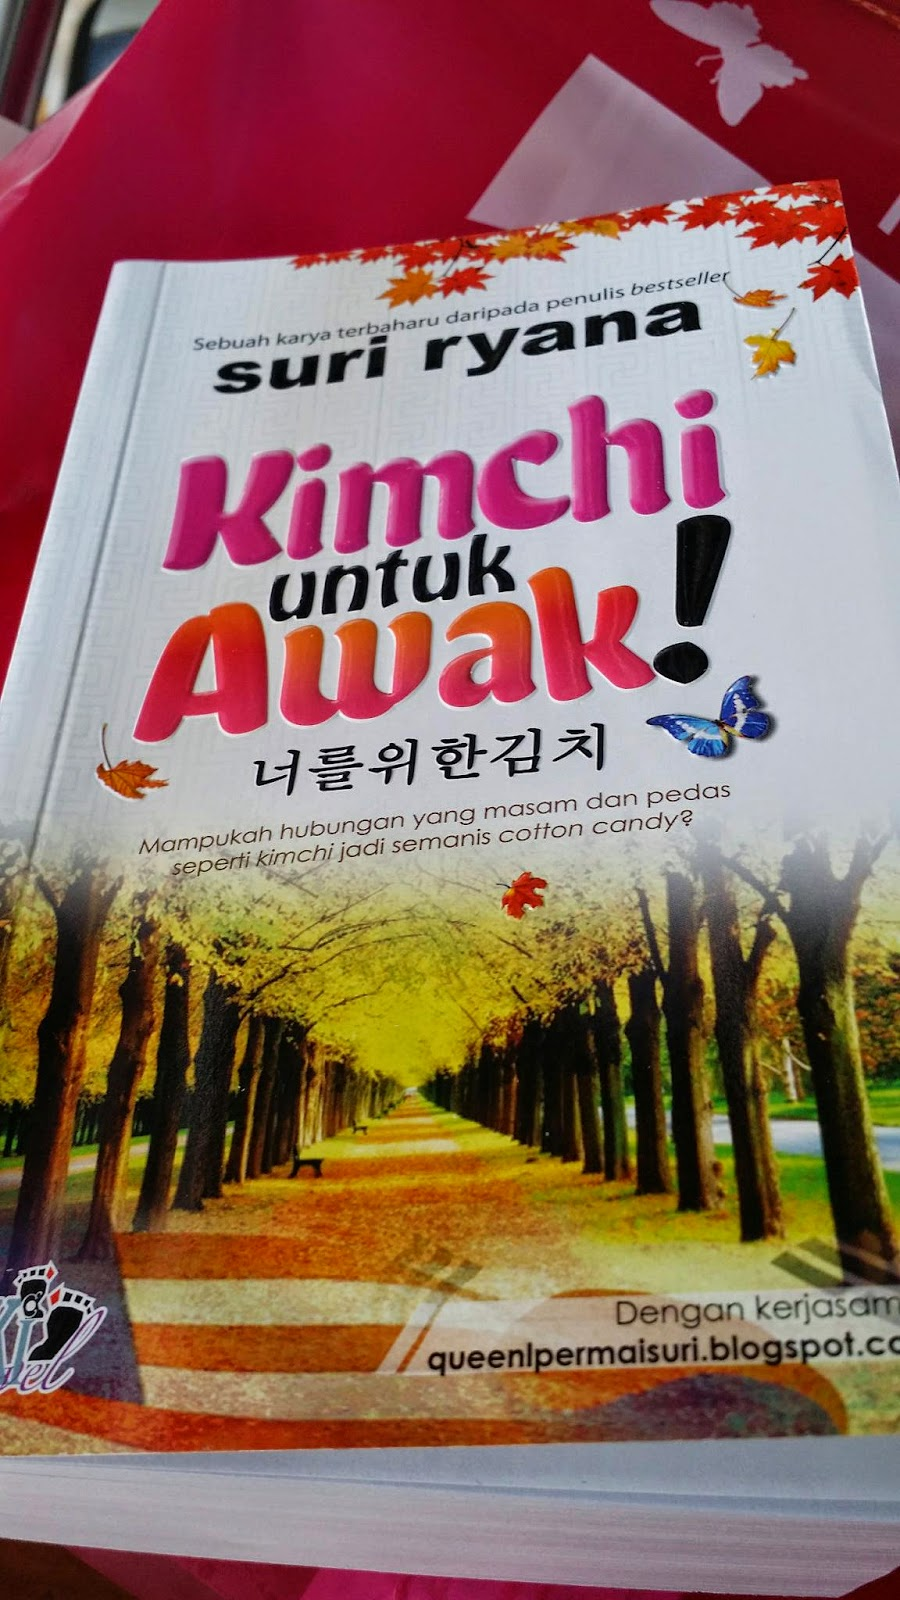 Resensi Novel: Kimchi untuk awak! - suri ryana